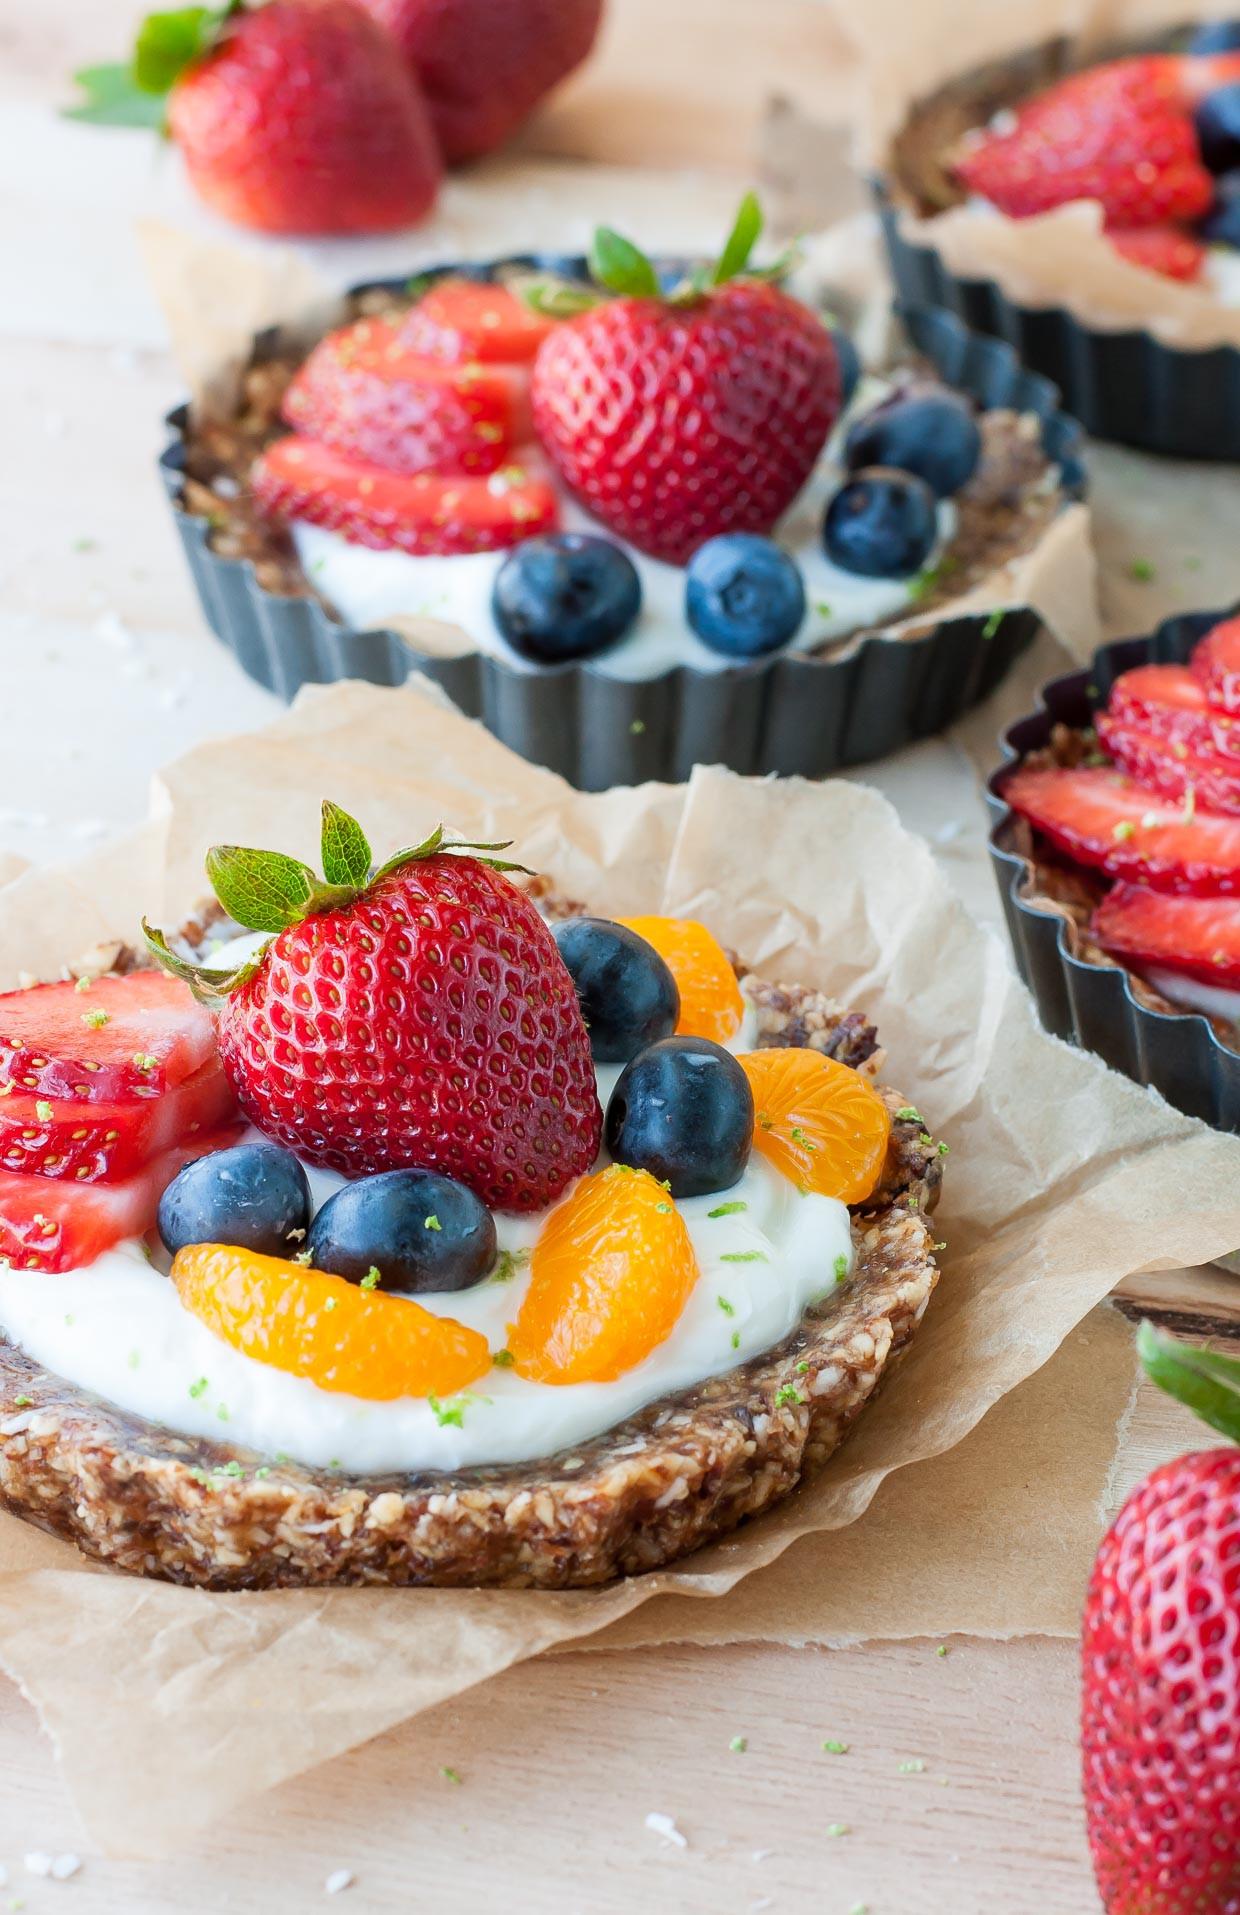 Healthy Baked Desserts  Healthy No Bake Coconut Lime Fruit and Yogurt Tarts Peas